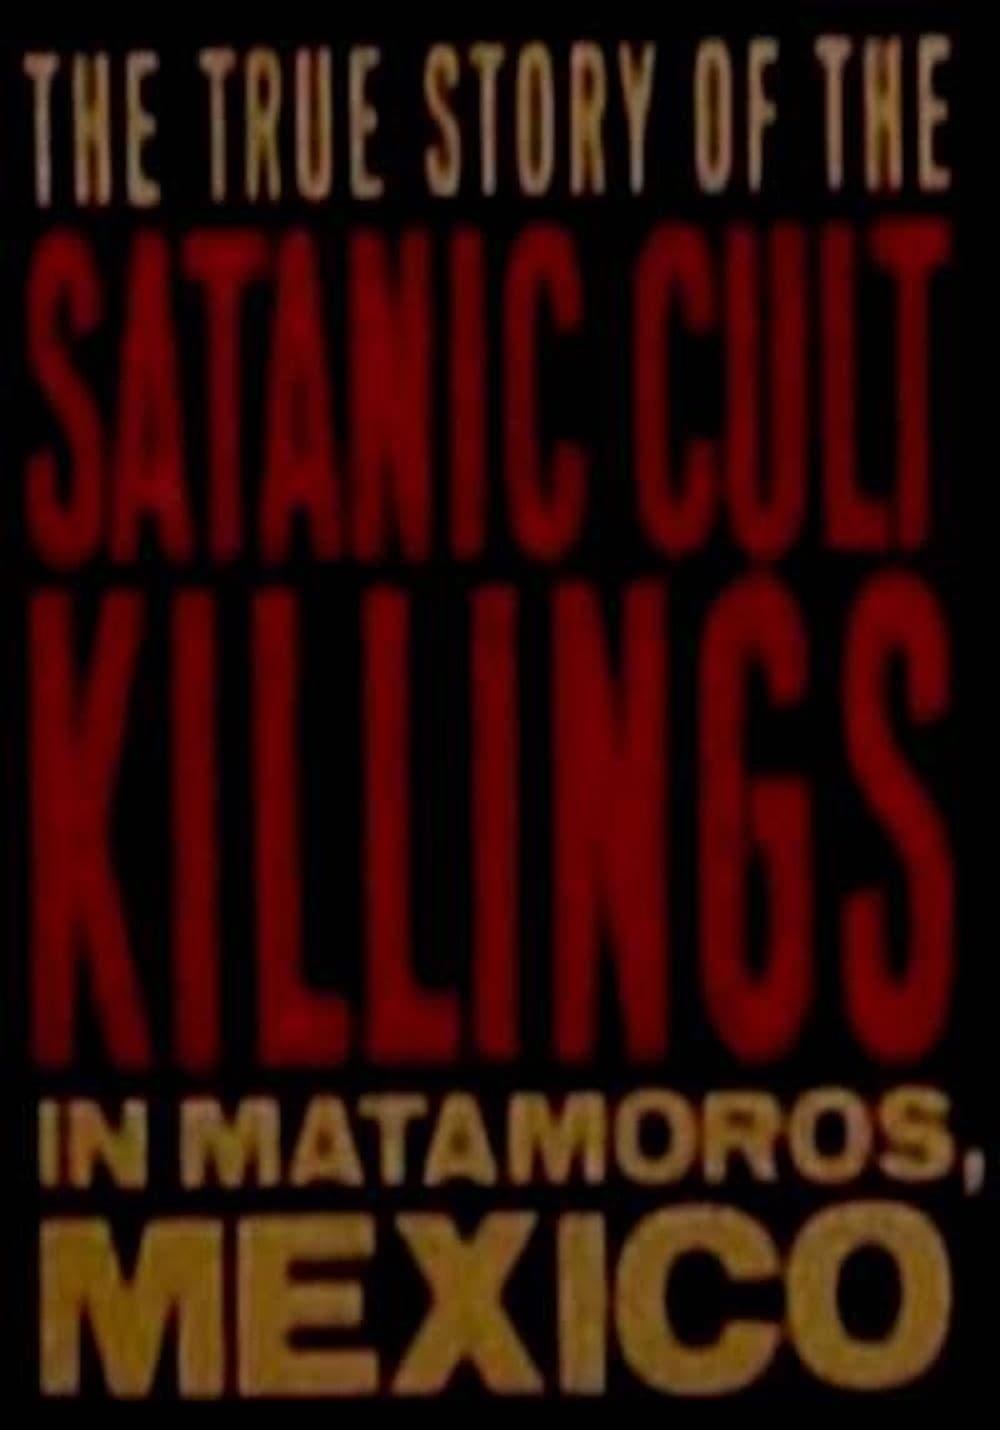 Rituales de Sangre: The True Story Behind the Matamoros Cult Killings